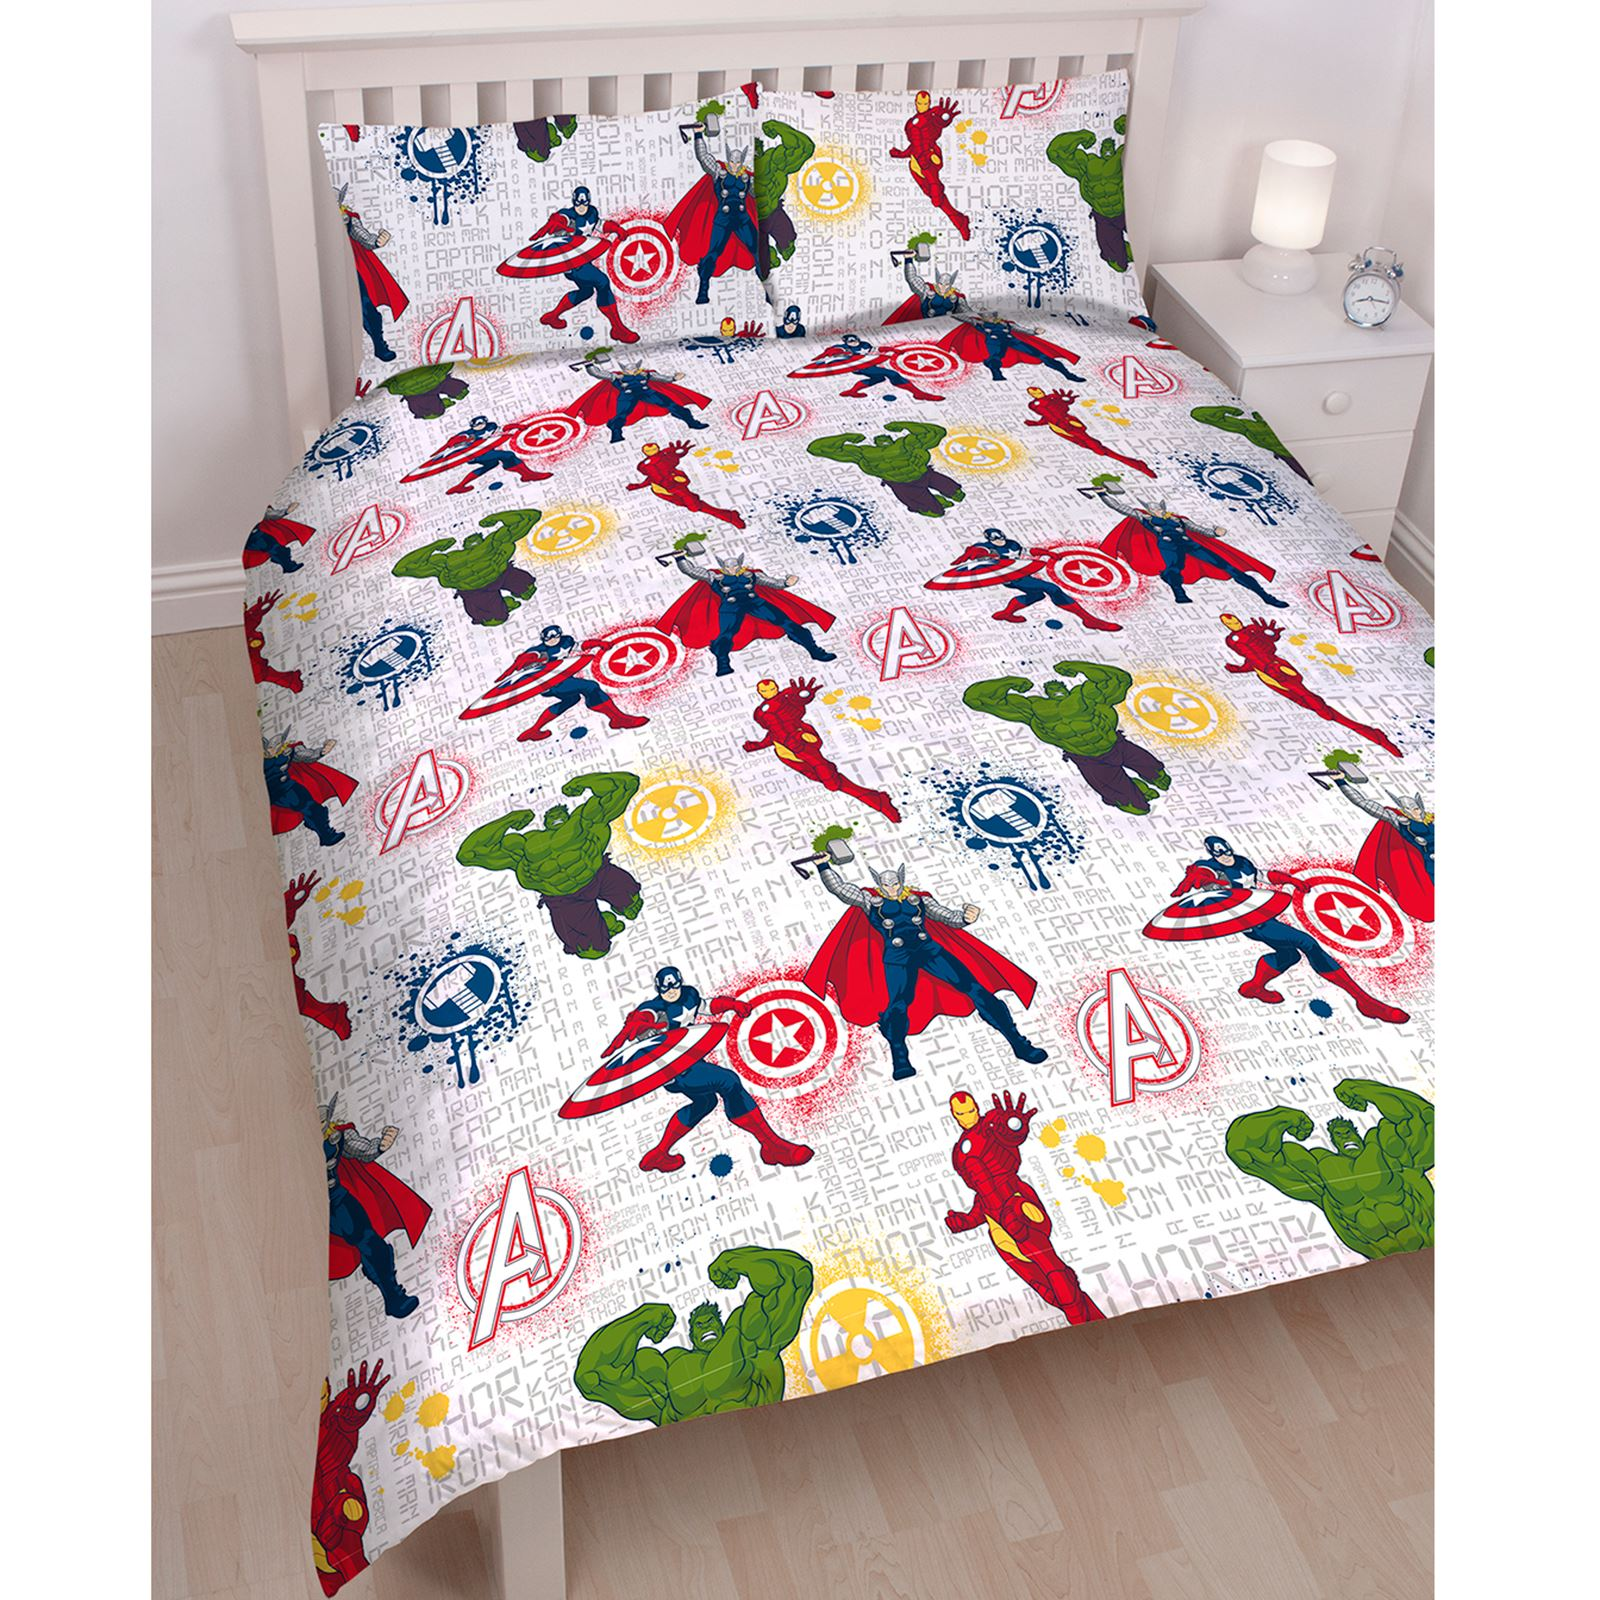 Avengers Bedroom Duvet Cover Sets Curtains Blanket Cushion